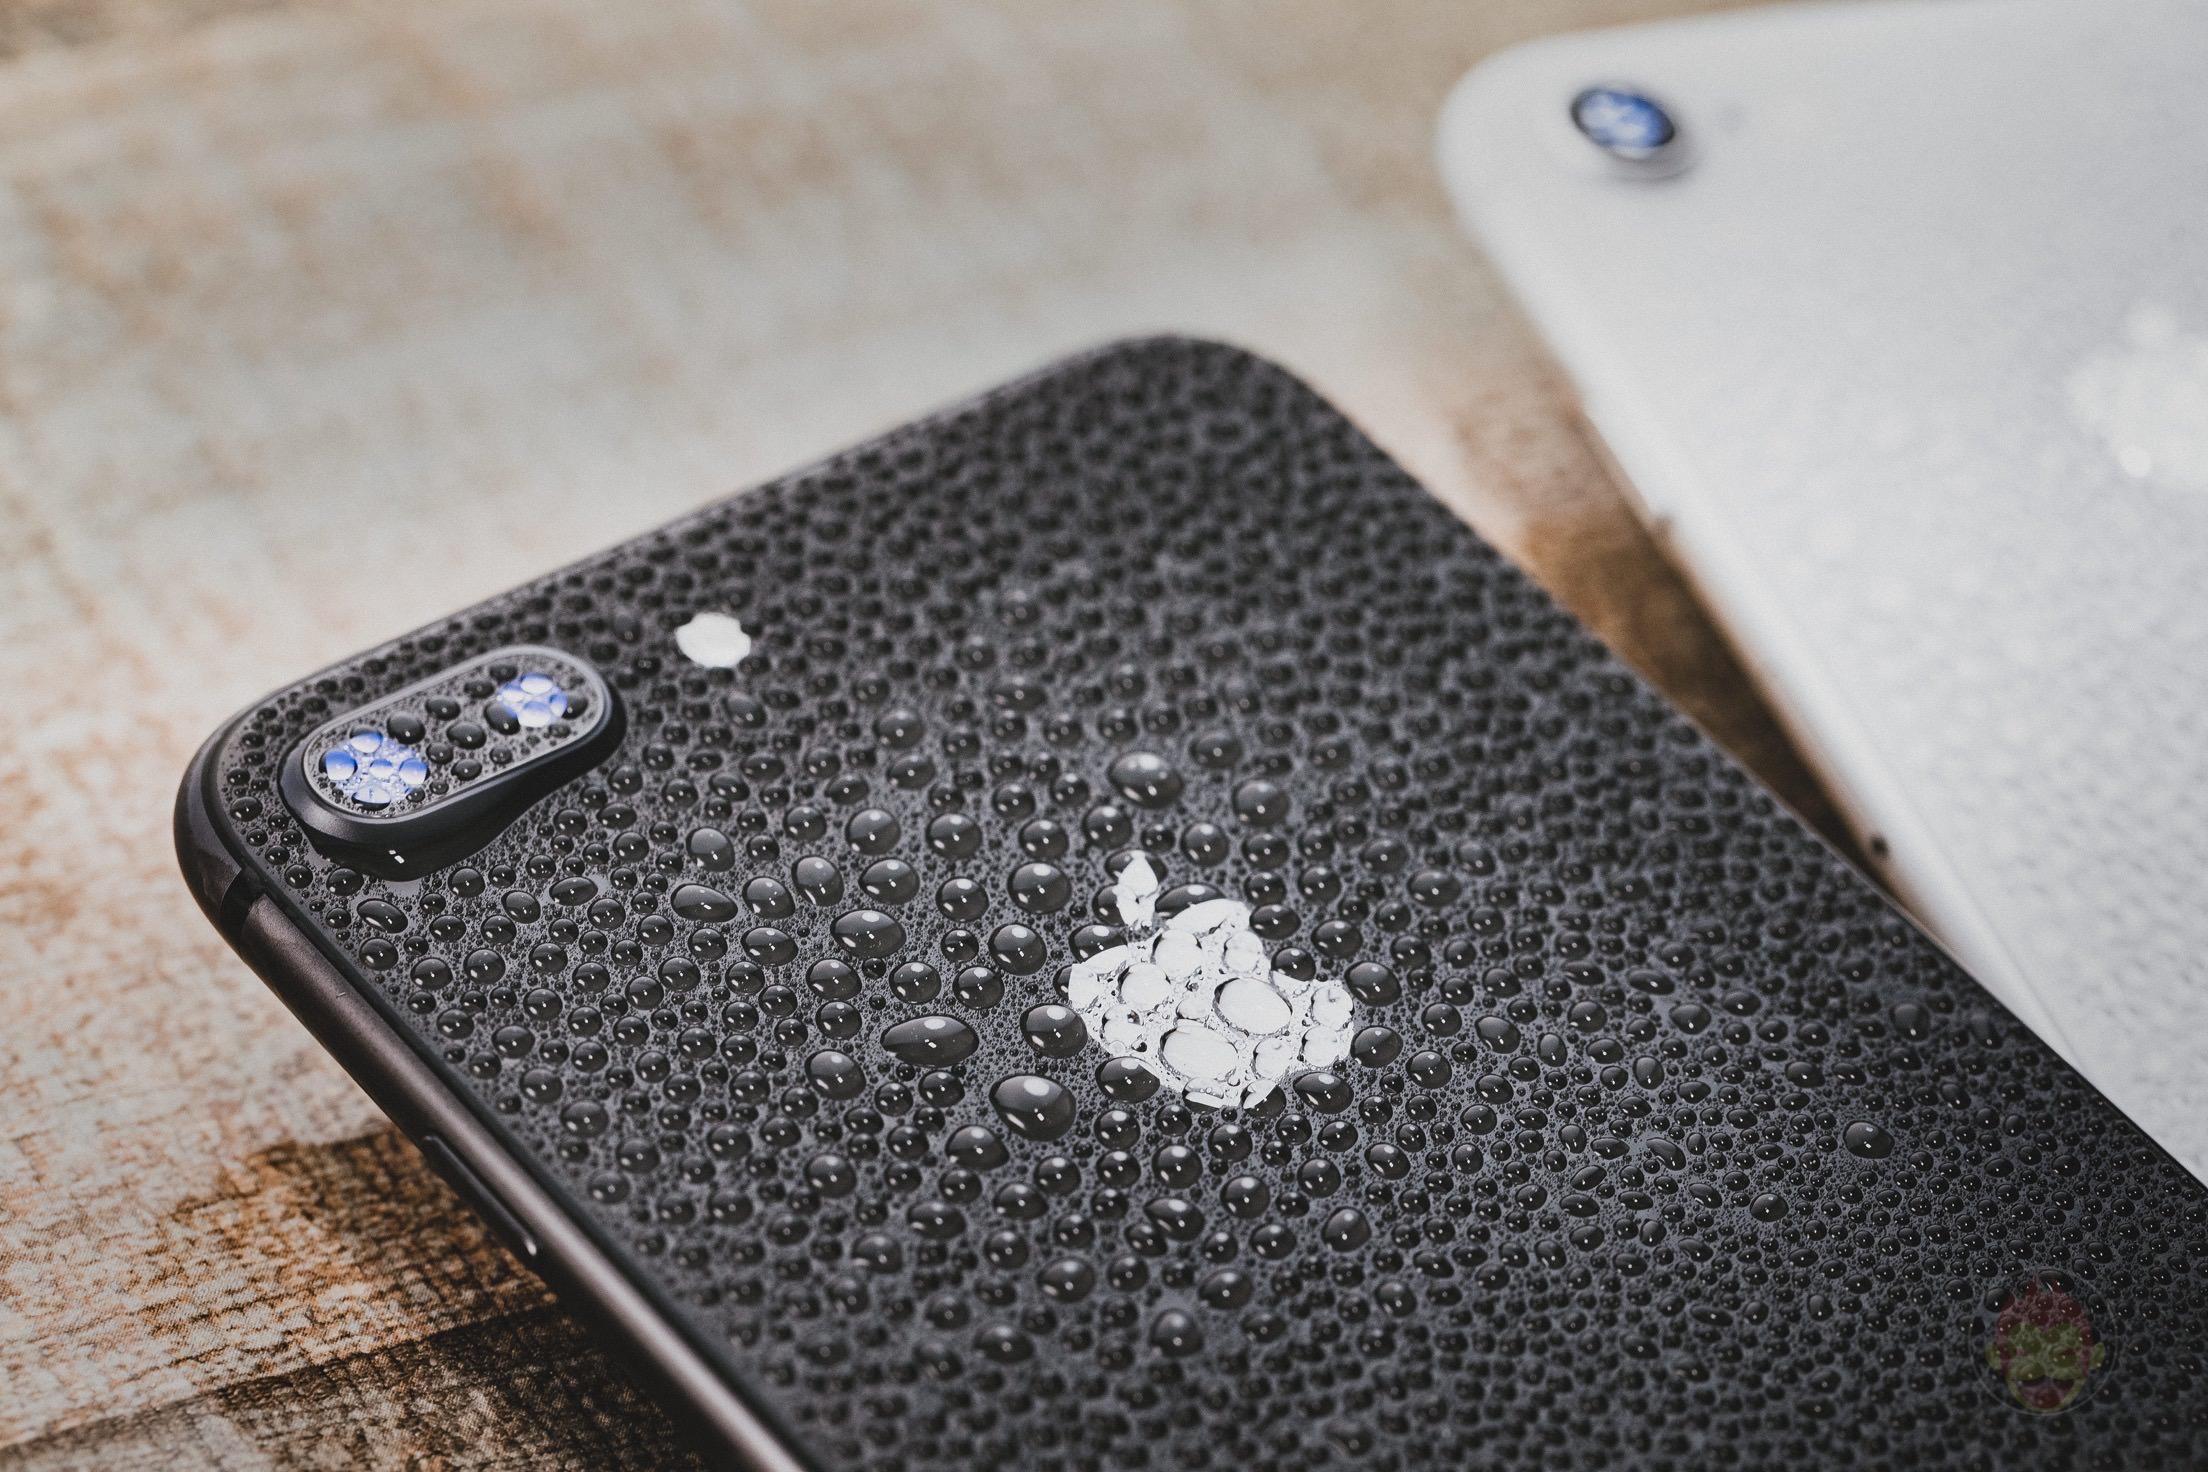 iPhone8-8Plus-Review-53.jpg